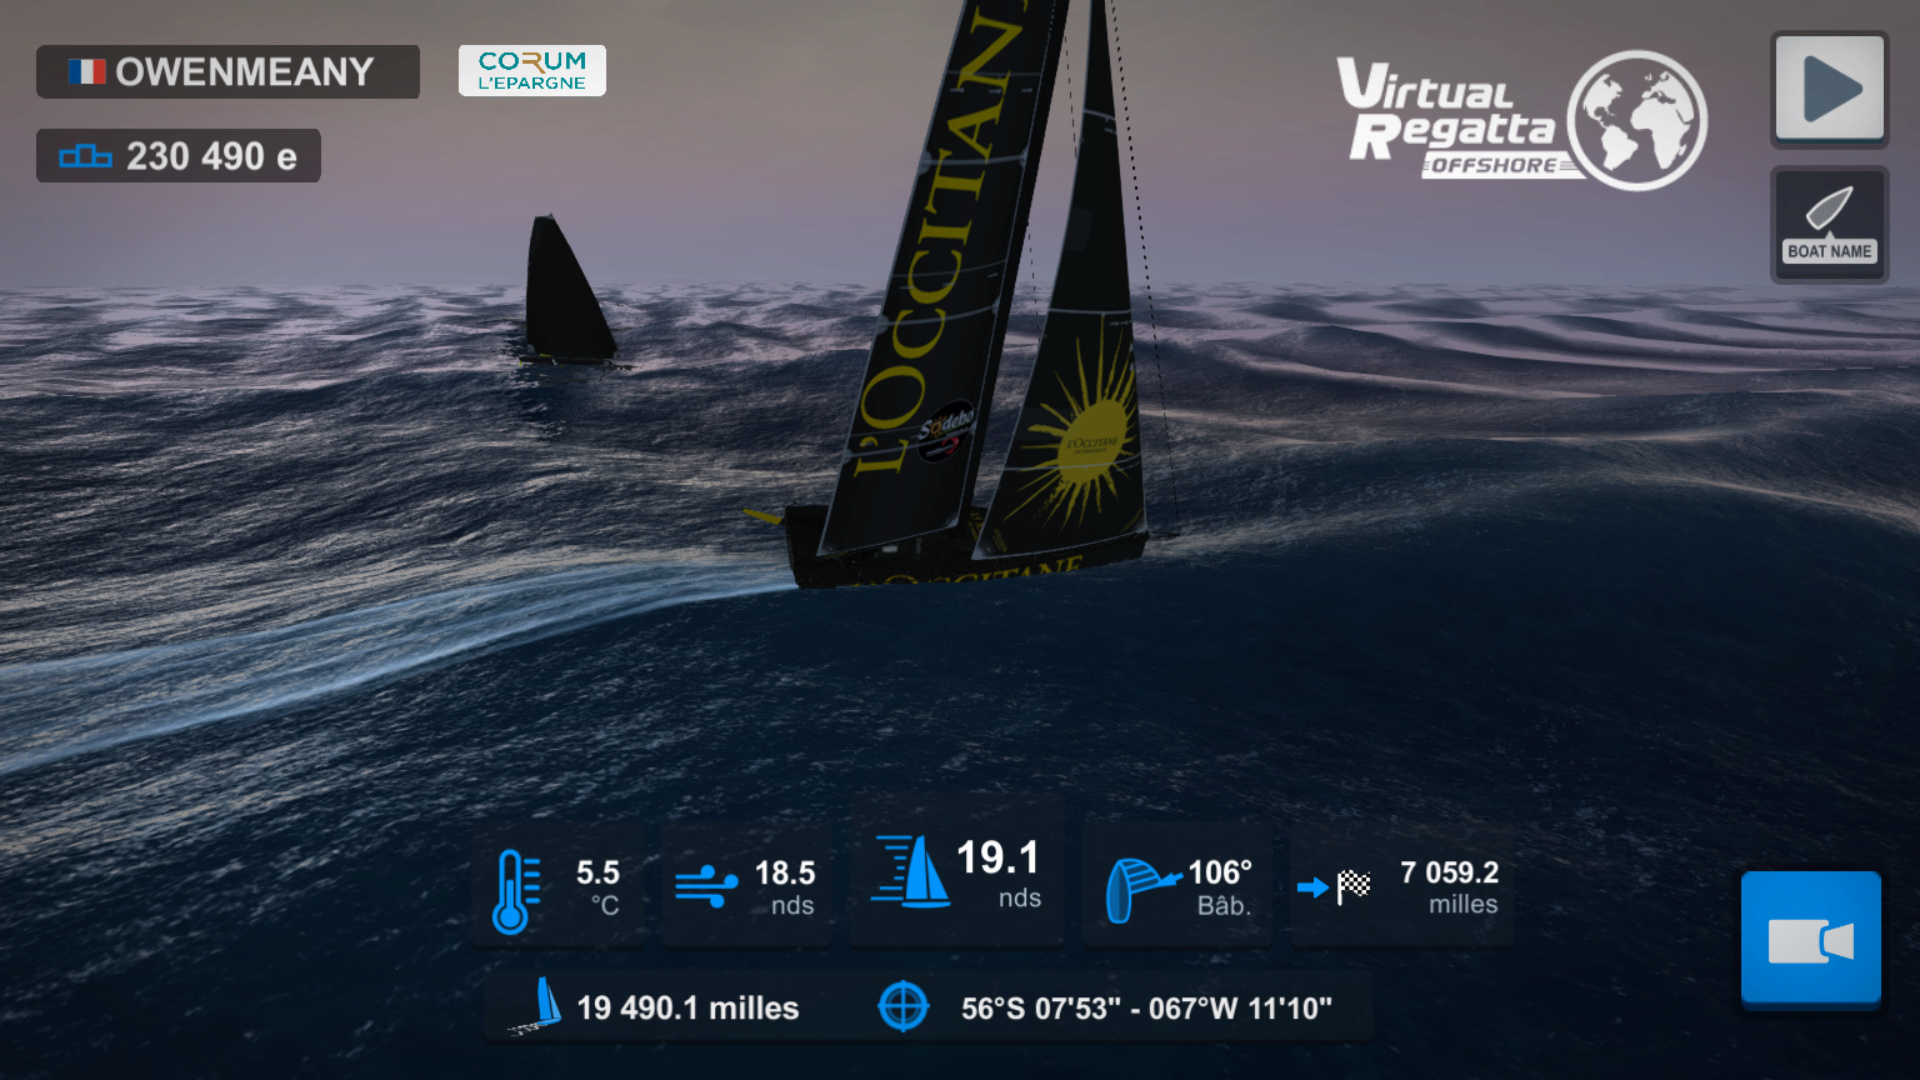 Vendée Globe virtuel: Virtual Regatta, édition 2020 - Page 2 Captur66